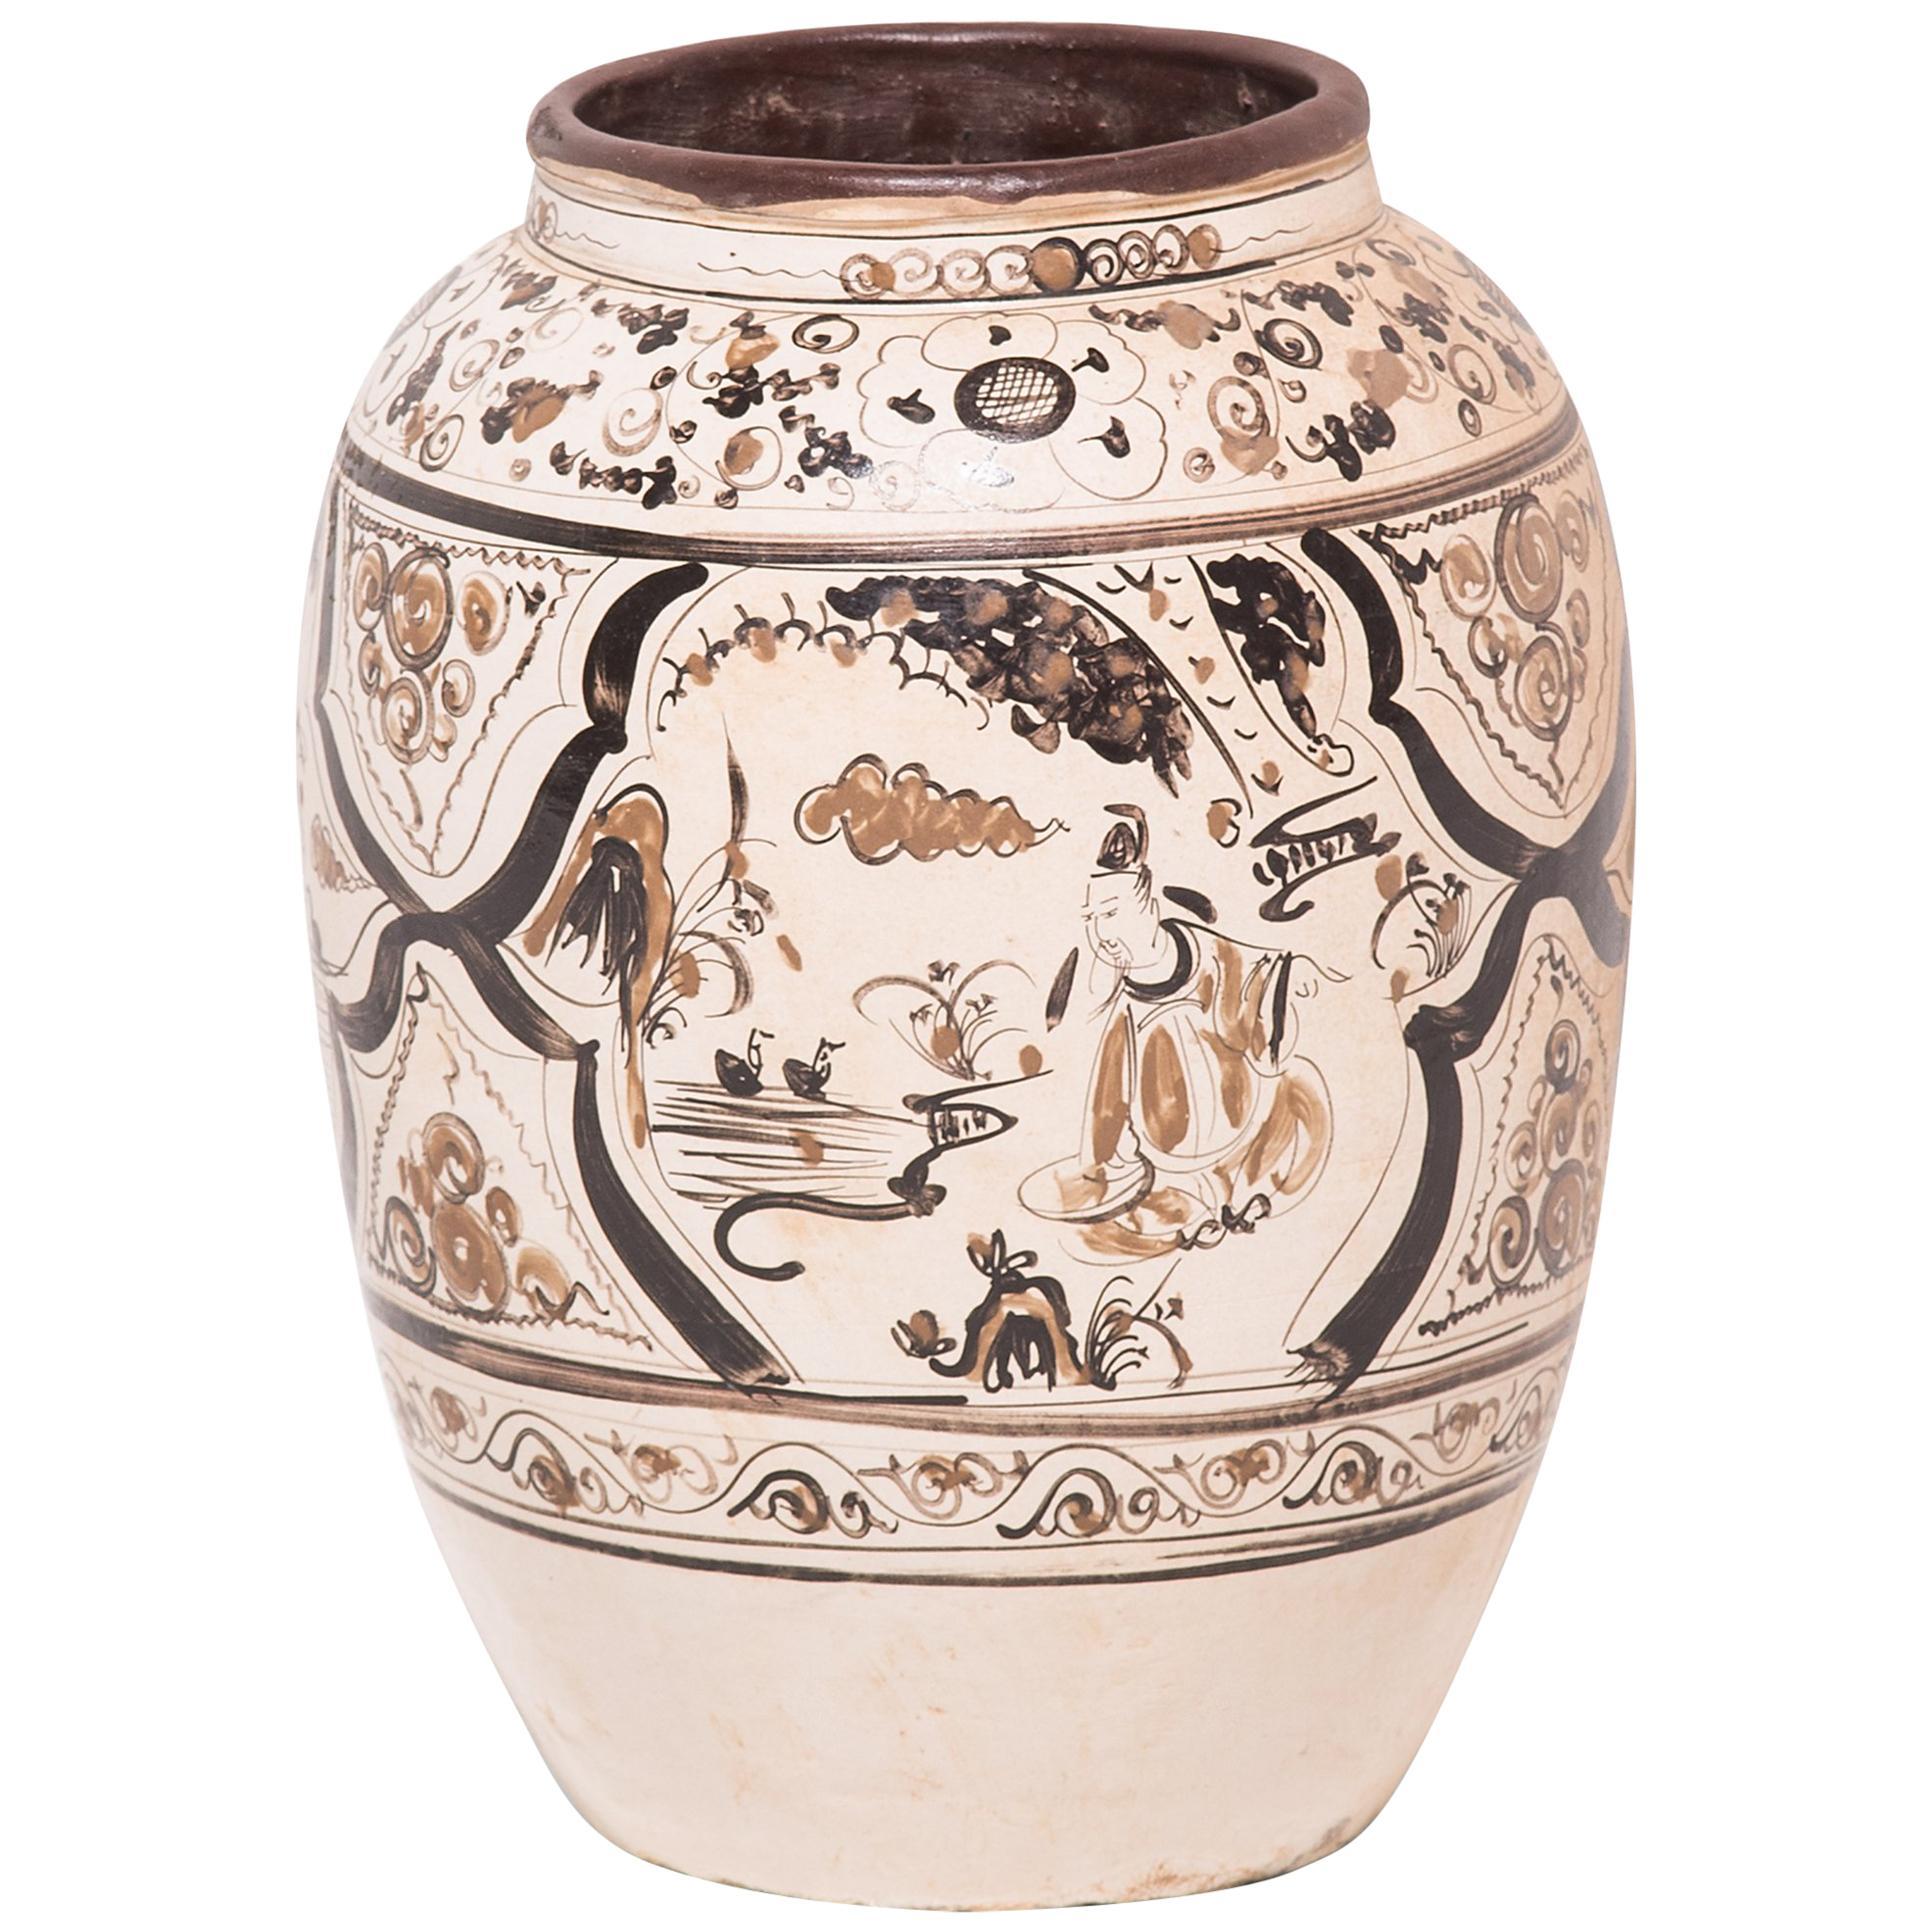 Chinese Qing Scholars' Wine Jar